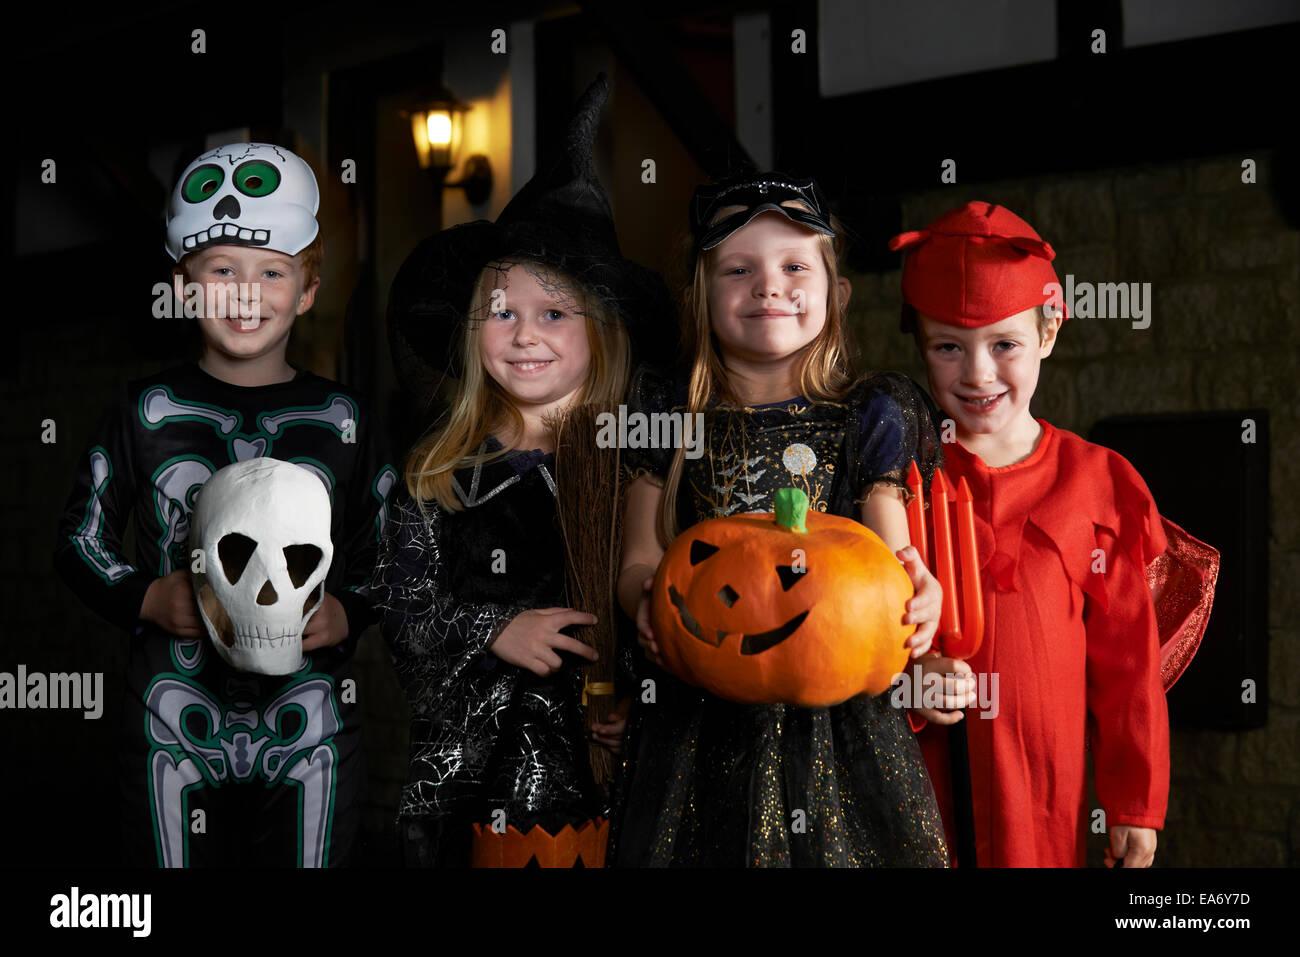 Halloween Party avec enfants trick or treating en costume Photo Stock